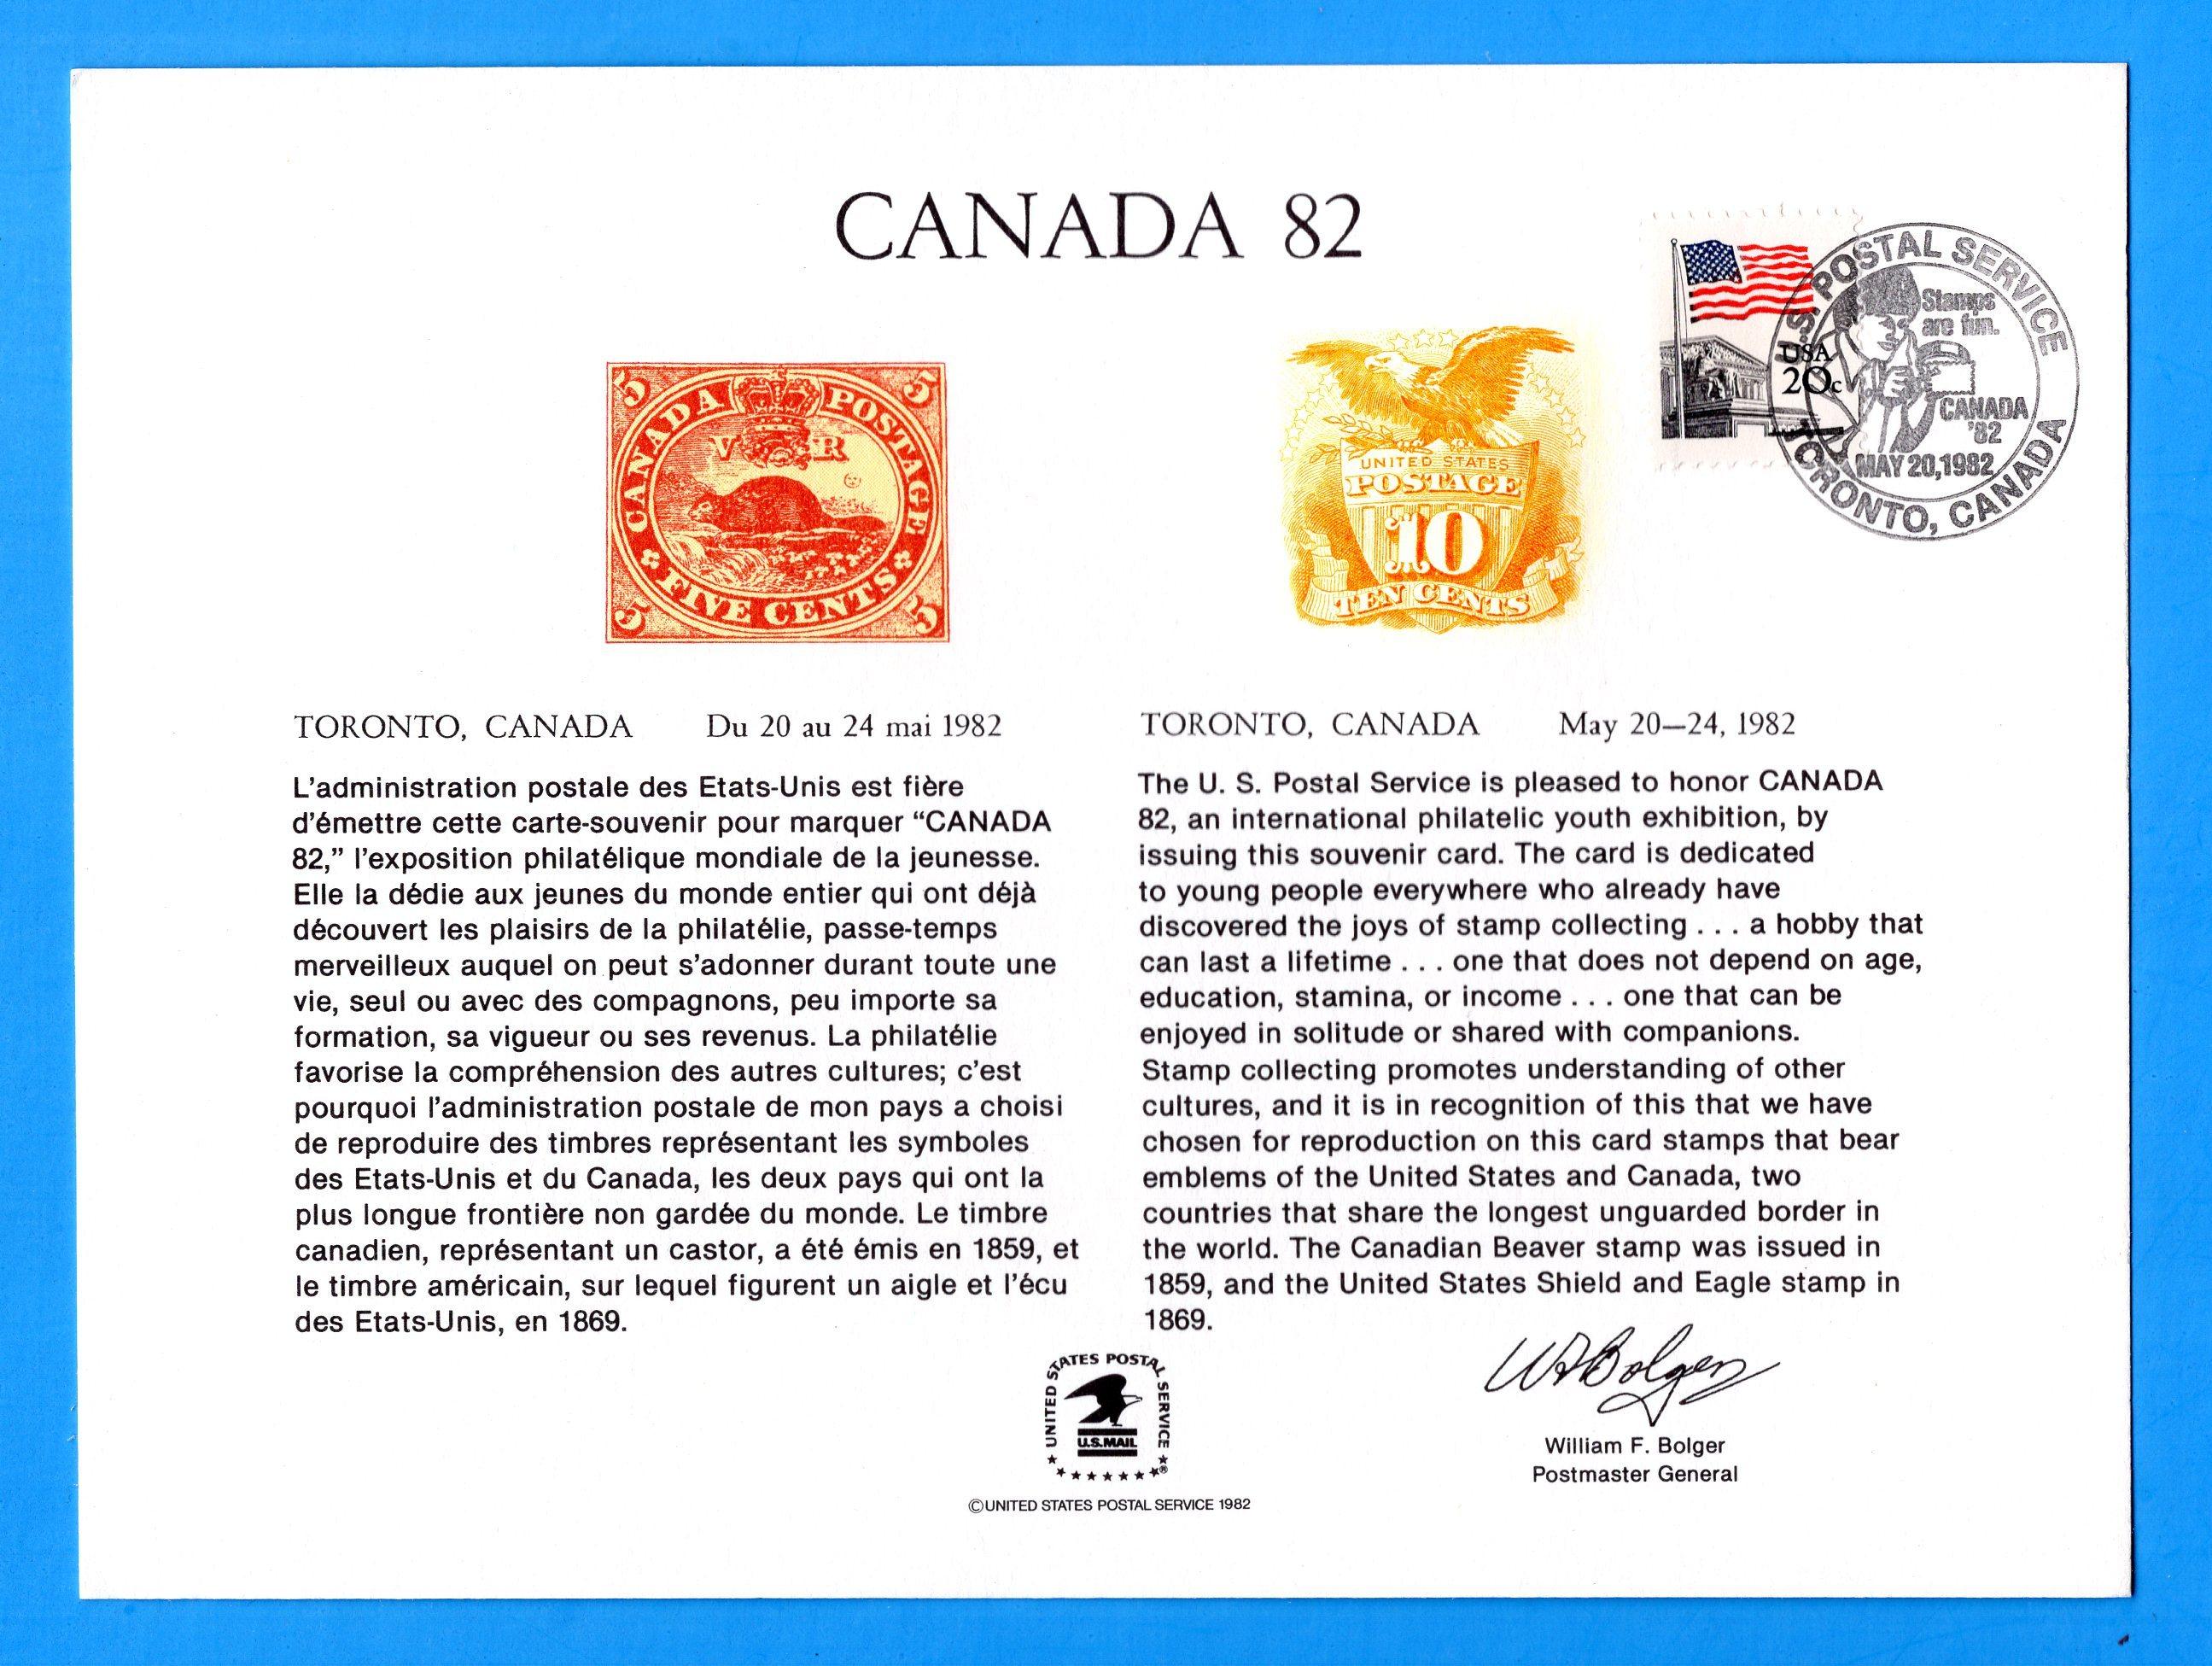 CANADA '82 - Franked Toronto, Canada May 20, 1982 Souvenir Cardvenir Card